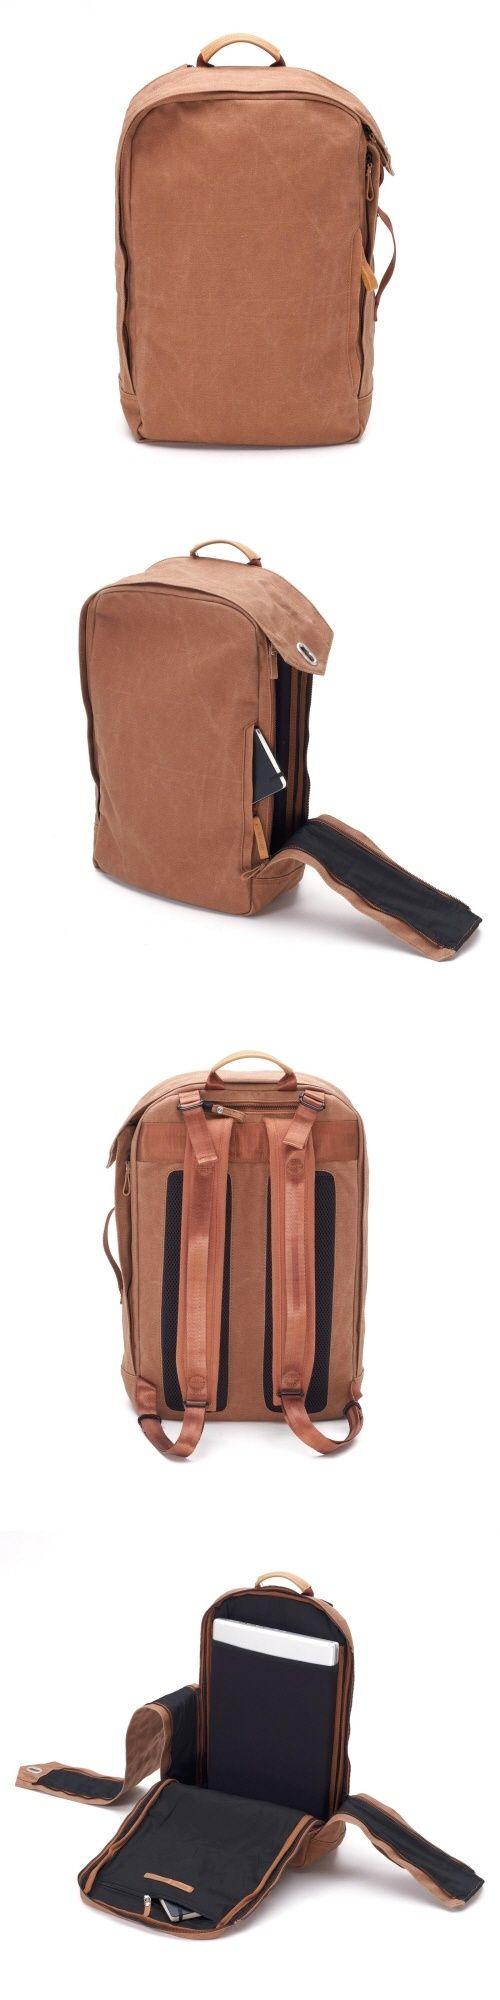 I love this bag